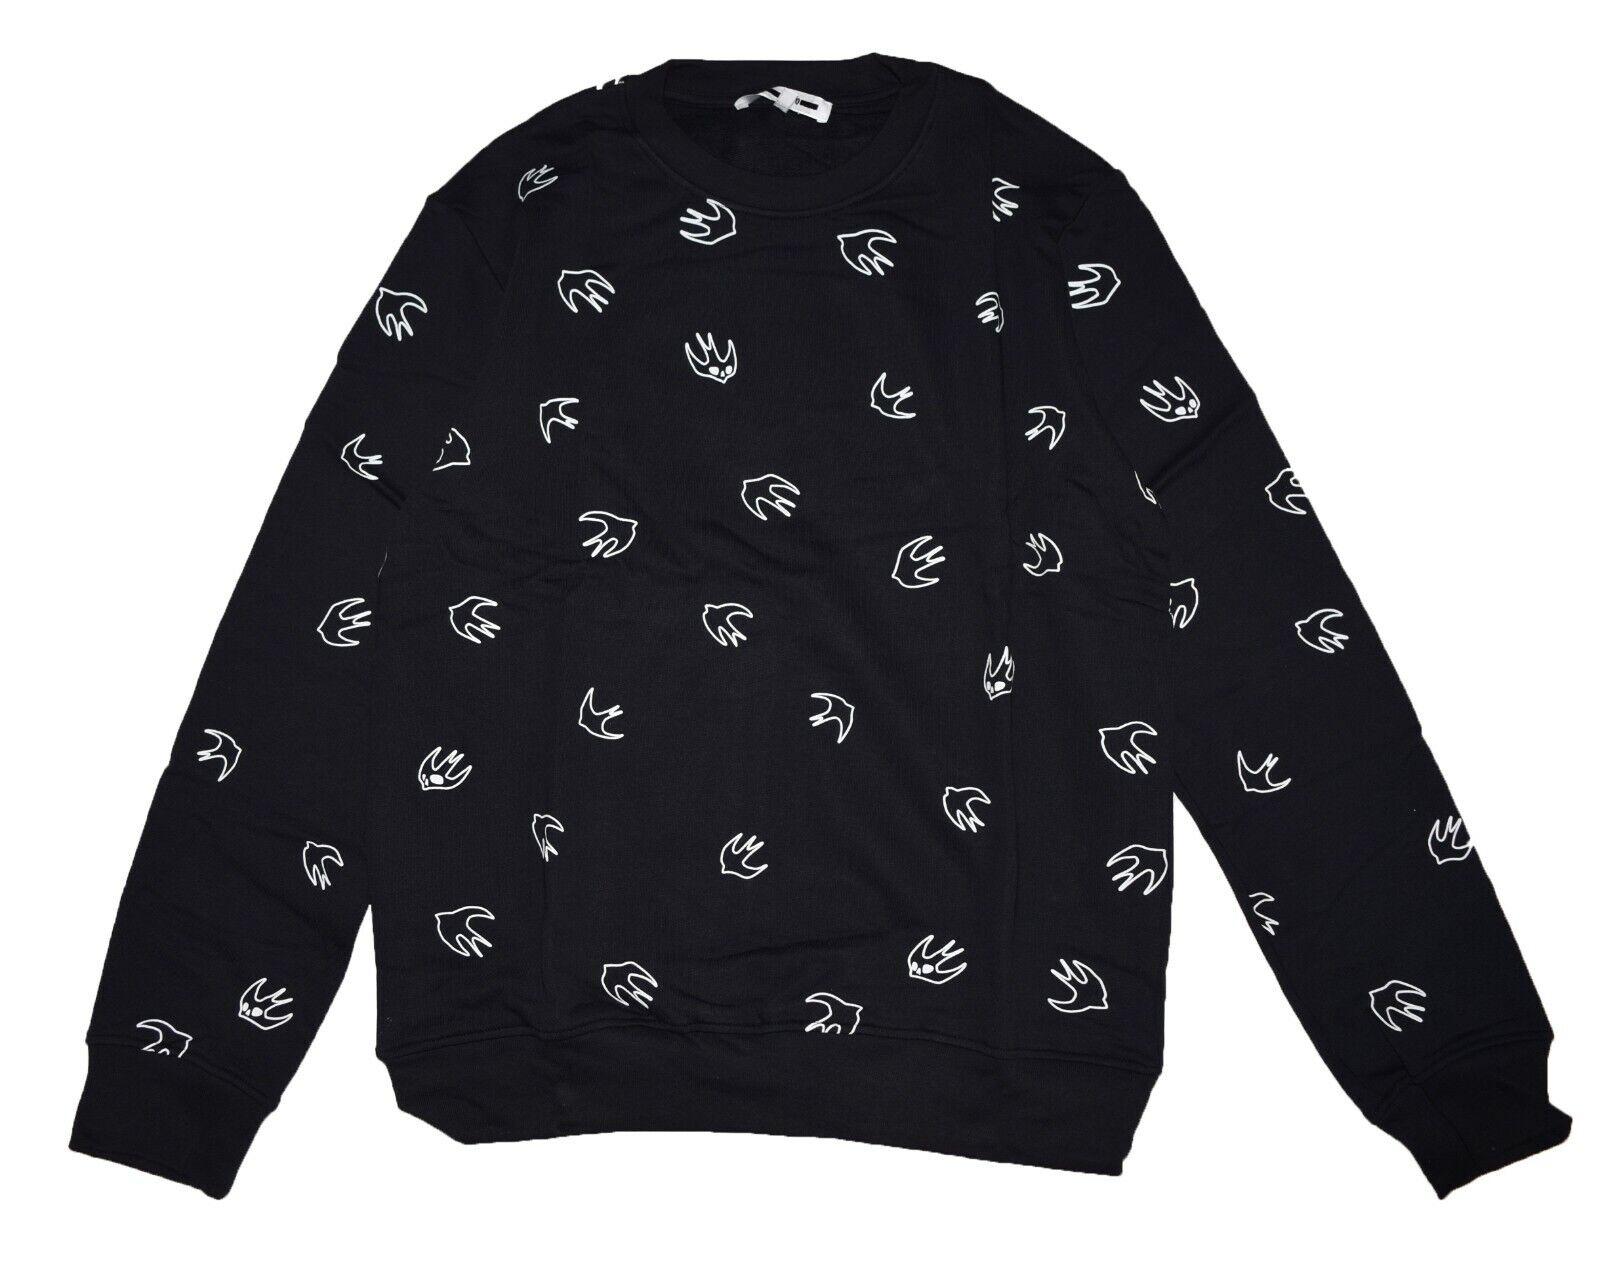 McQ Alexander McQueen Signature Swallow Print Sweatshirt BLACK Size XL